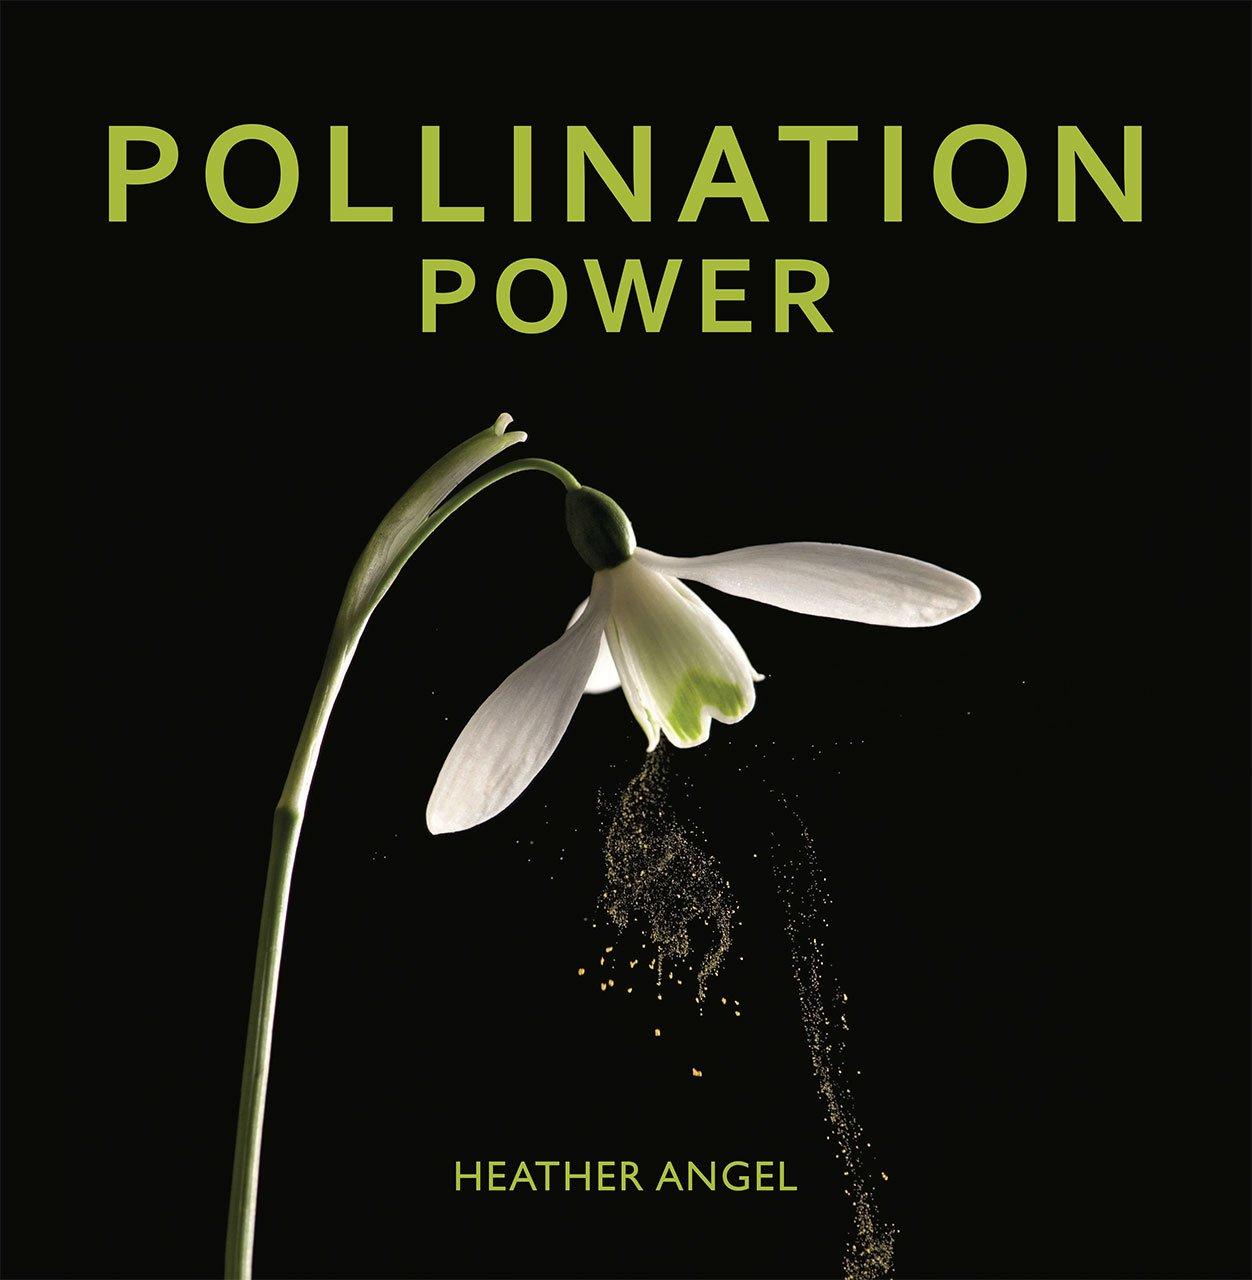 Pollination Power